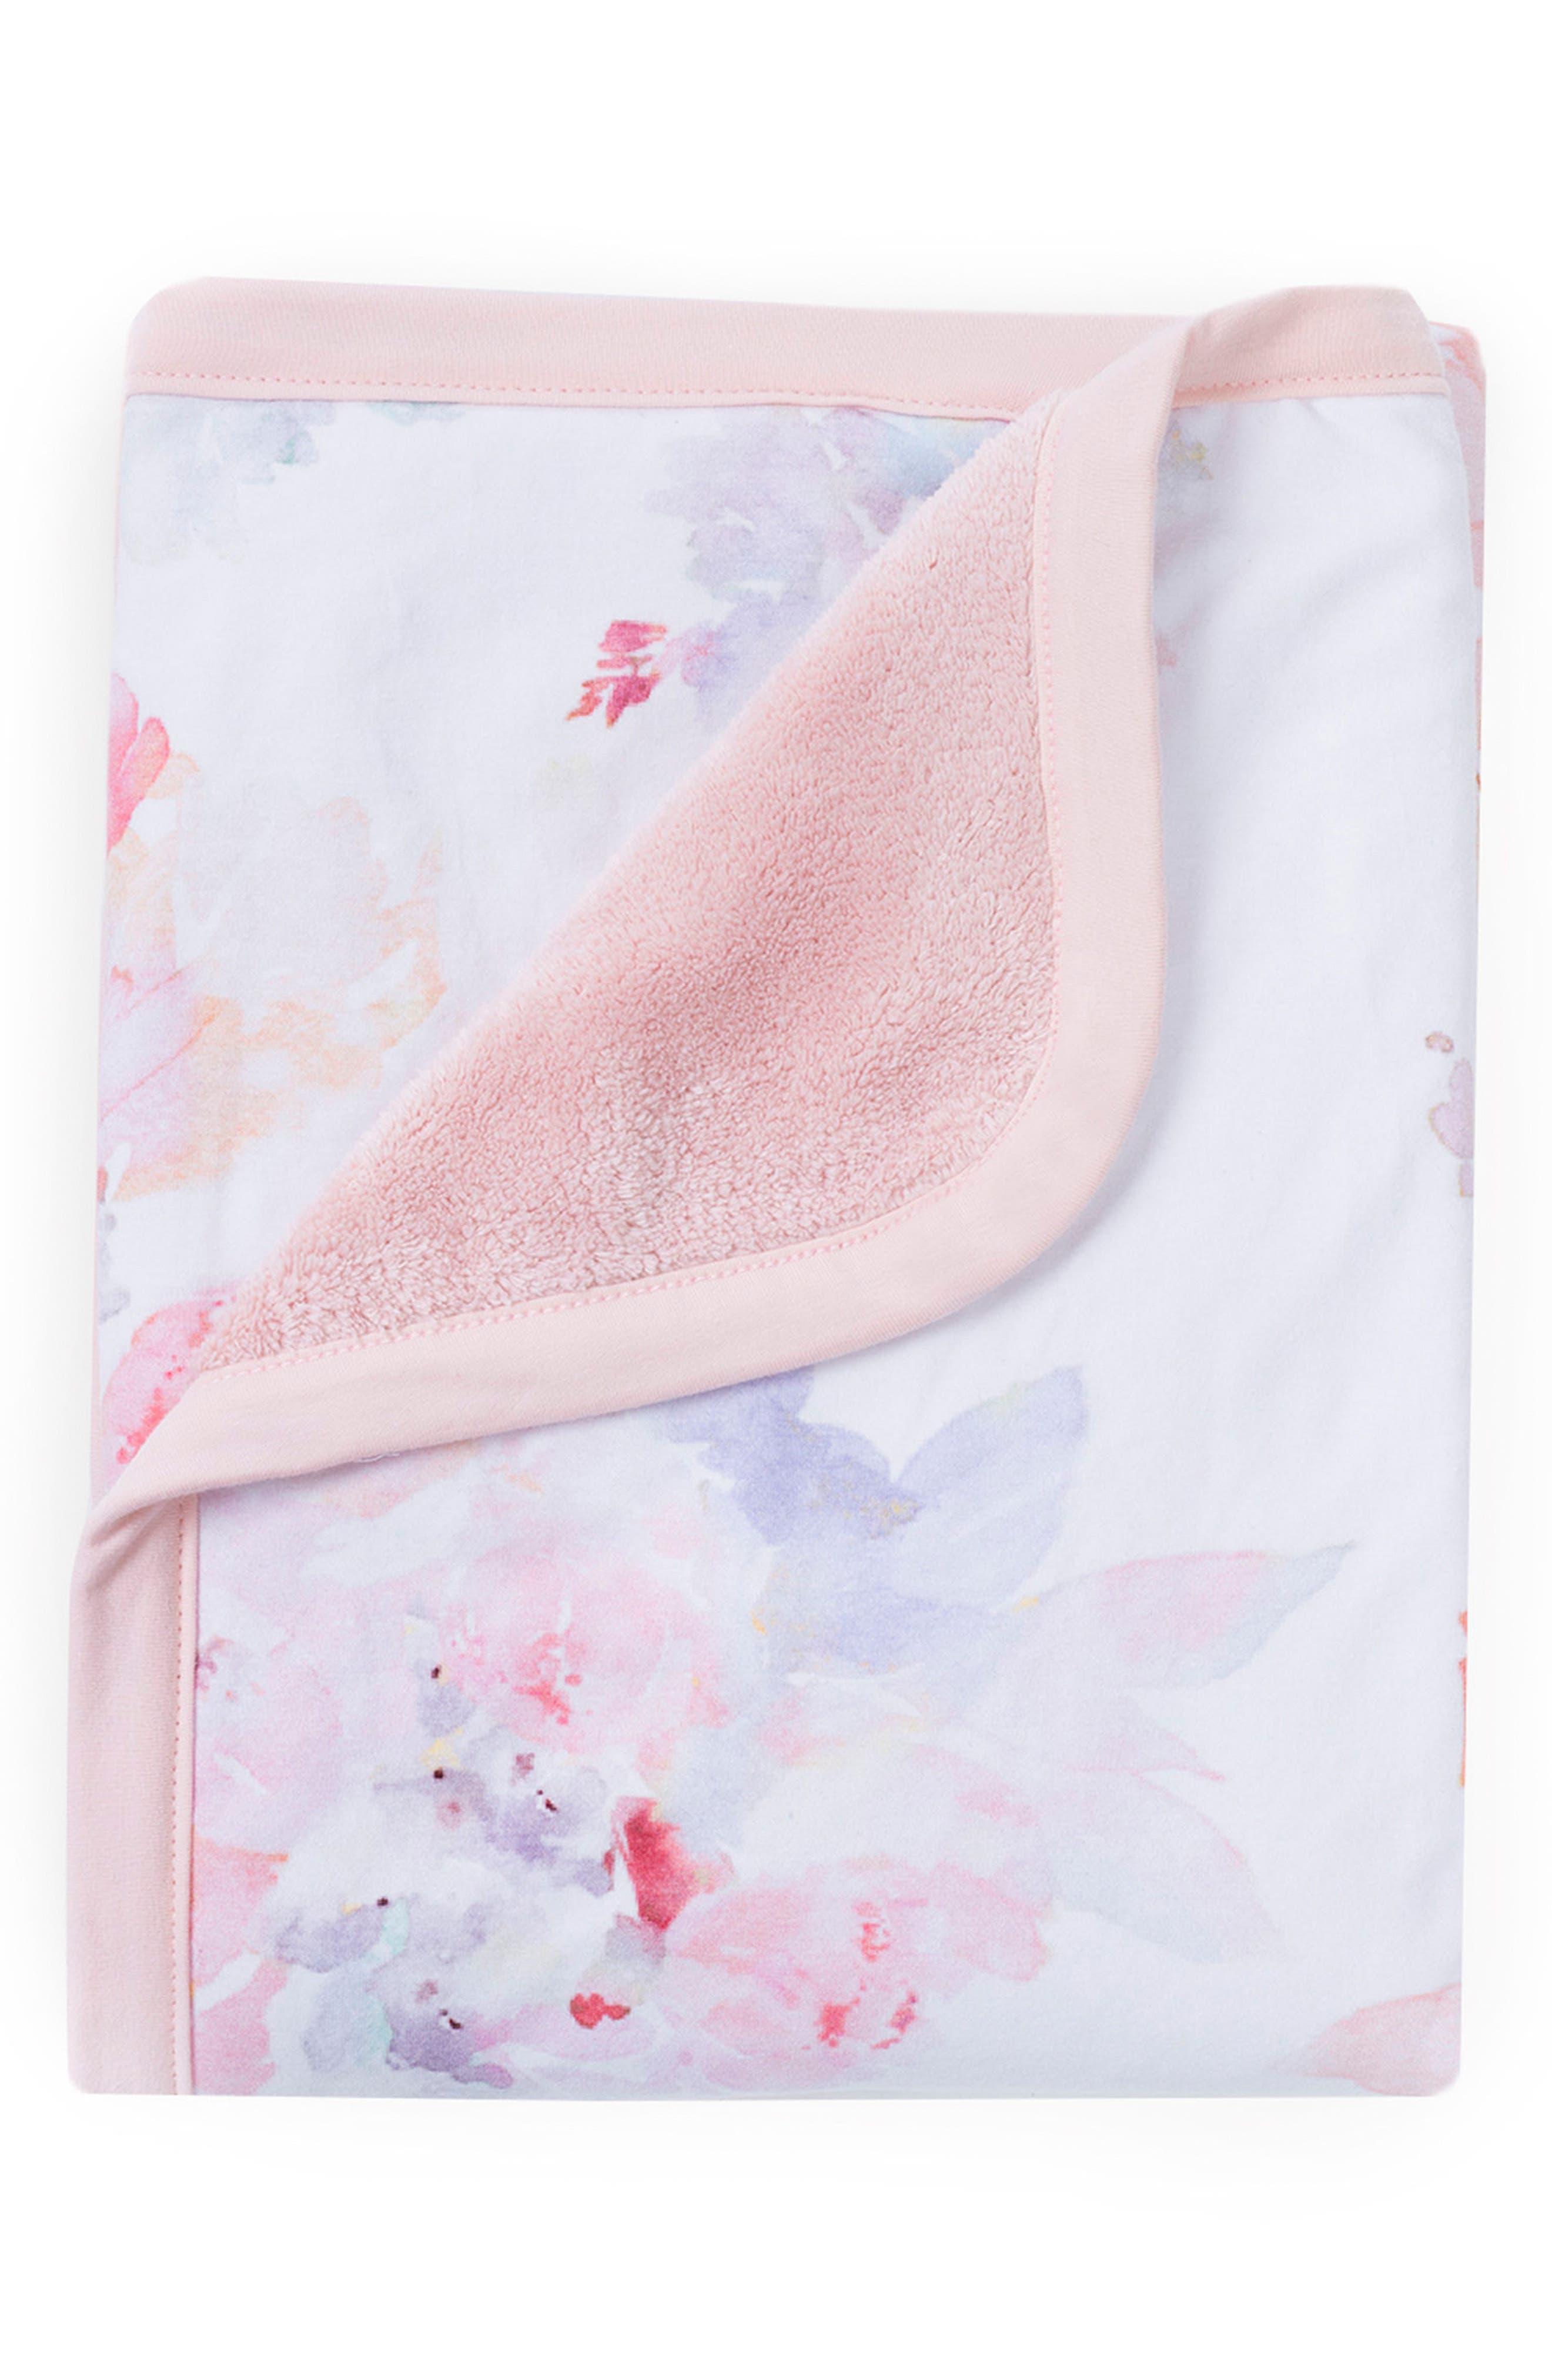 Prim Cuddle Blanket & Star Pillow Set,                             Alternate thumbnail 3, color,                             Prim